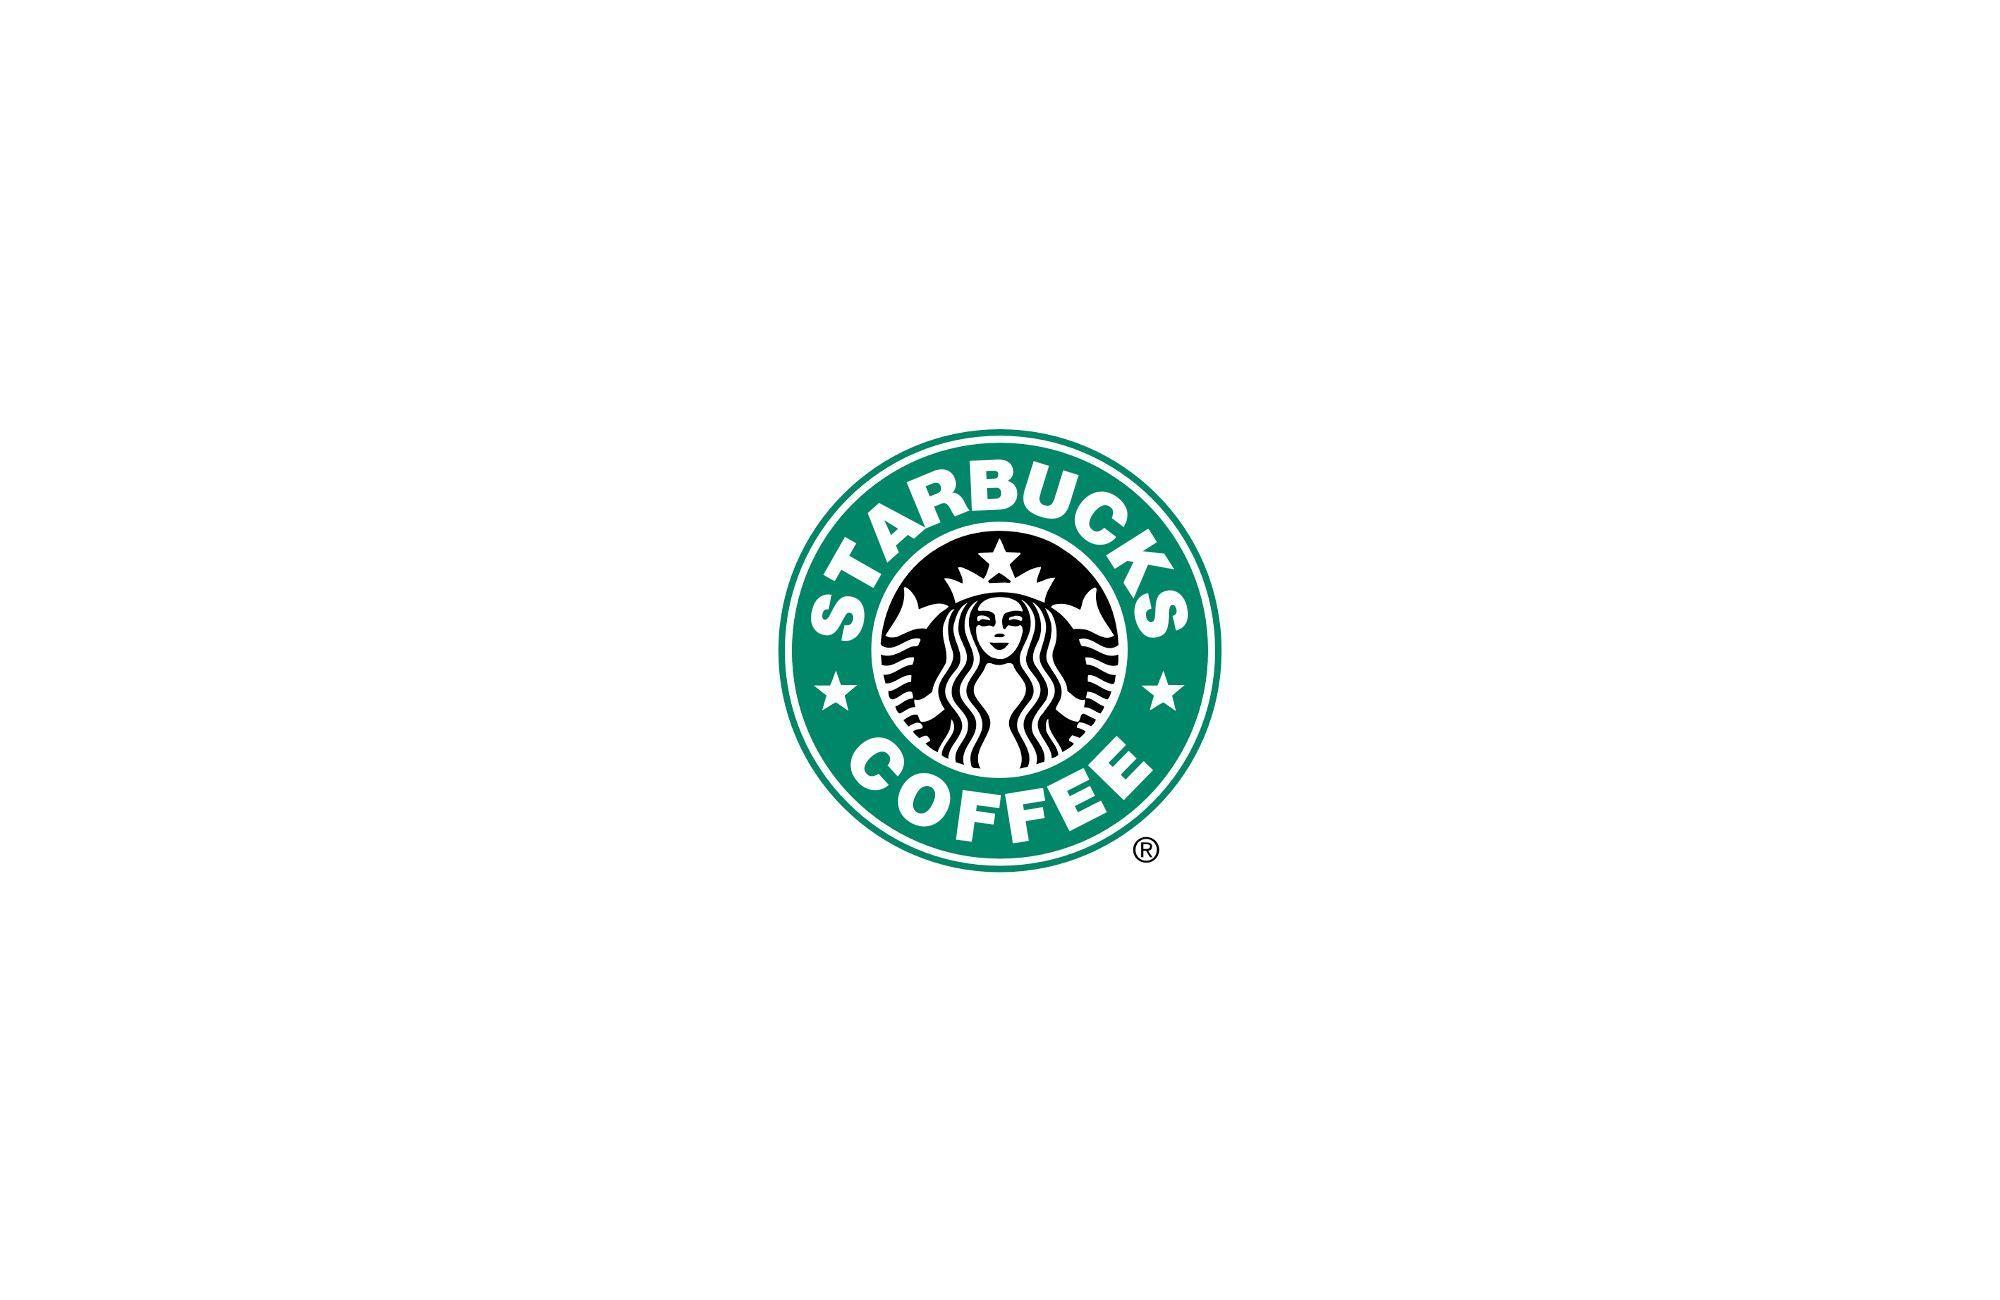 photo about Starbucks Logo Printable identify Little Starbucks Symbol - LogoDix